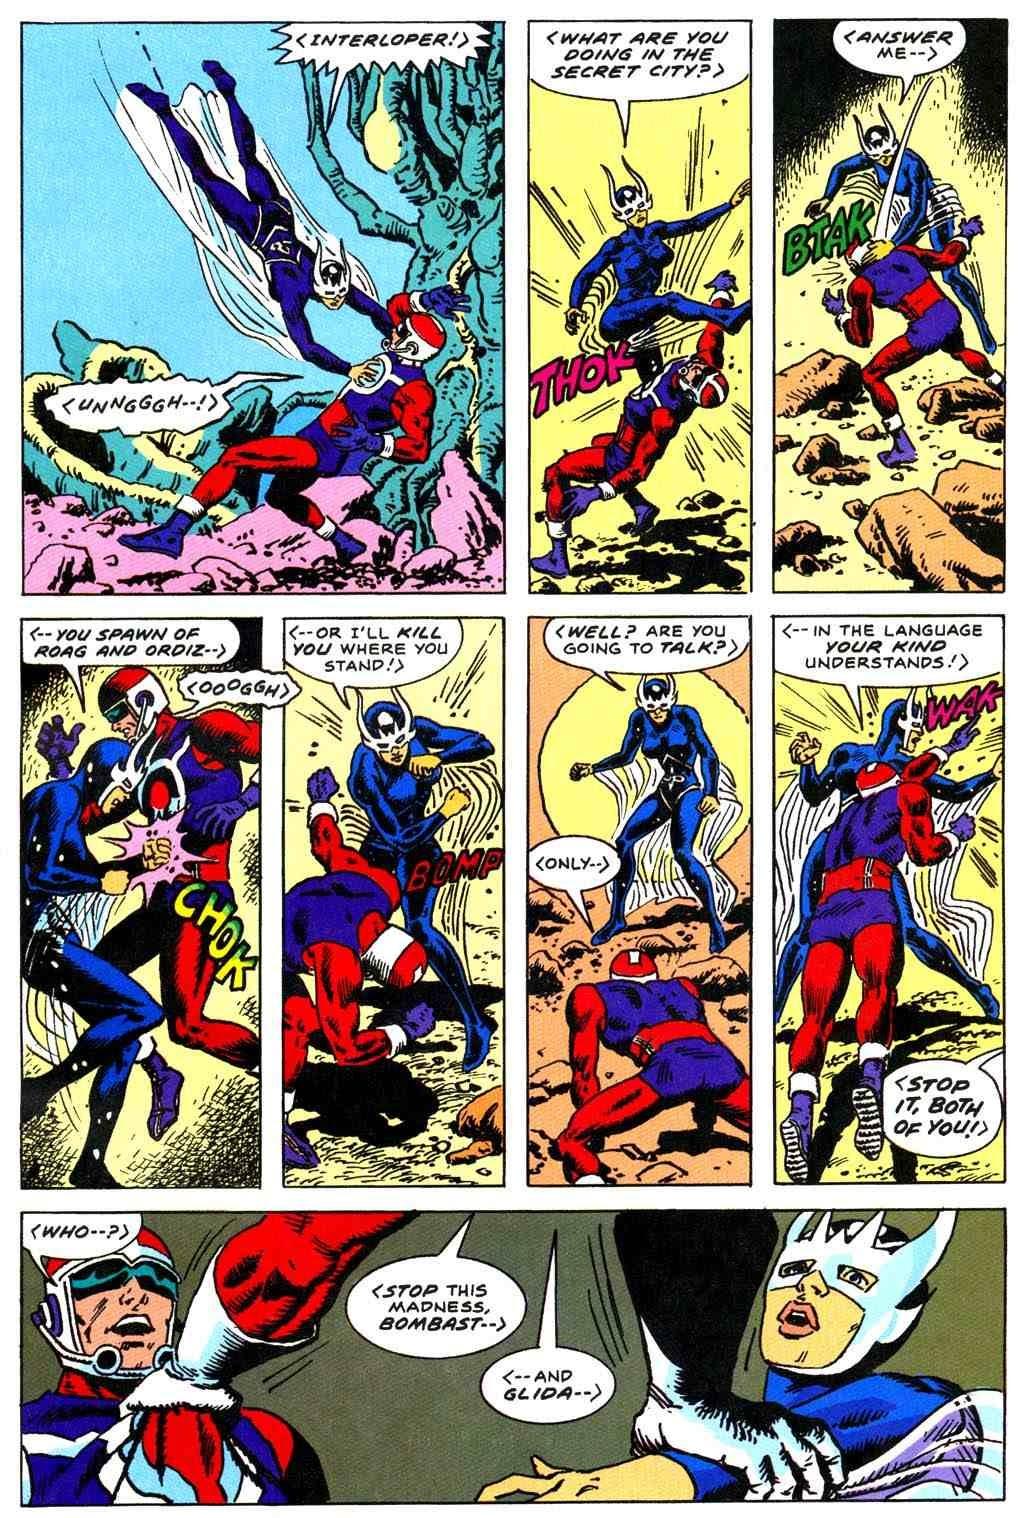 Read online Bombast comic -  Issue # Full - 29